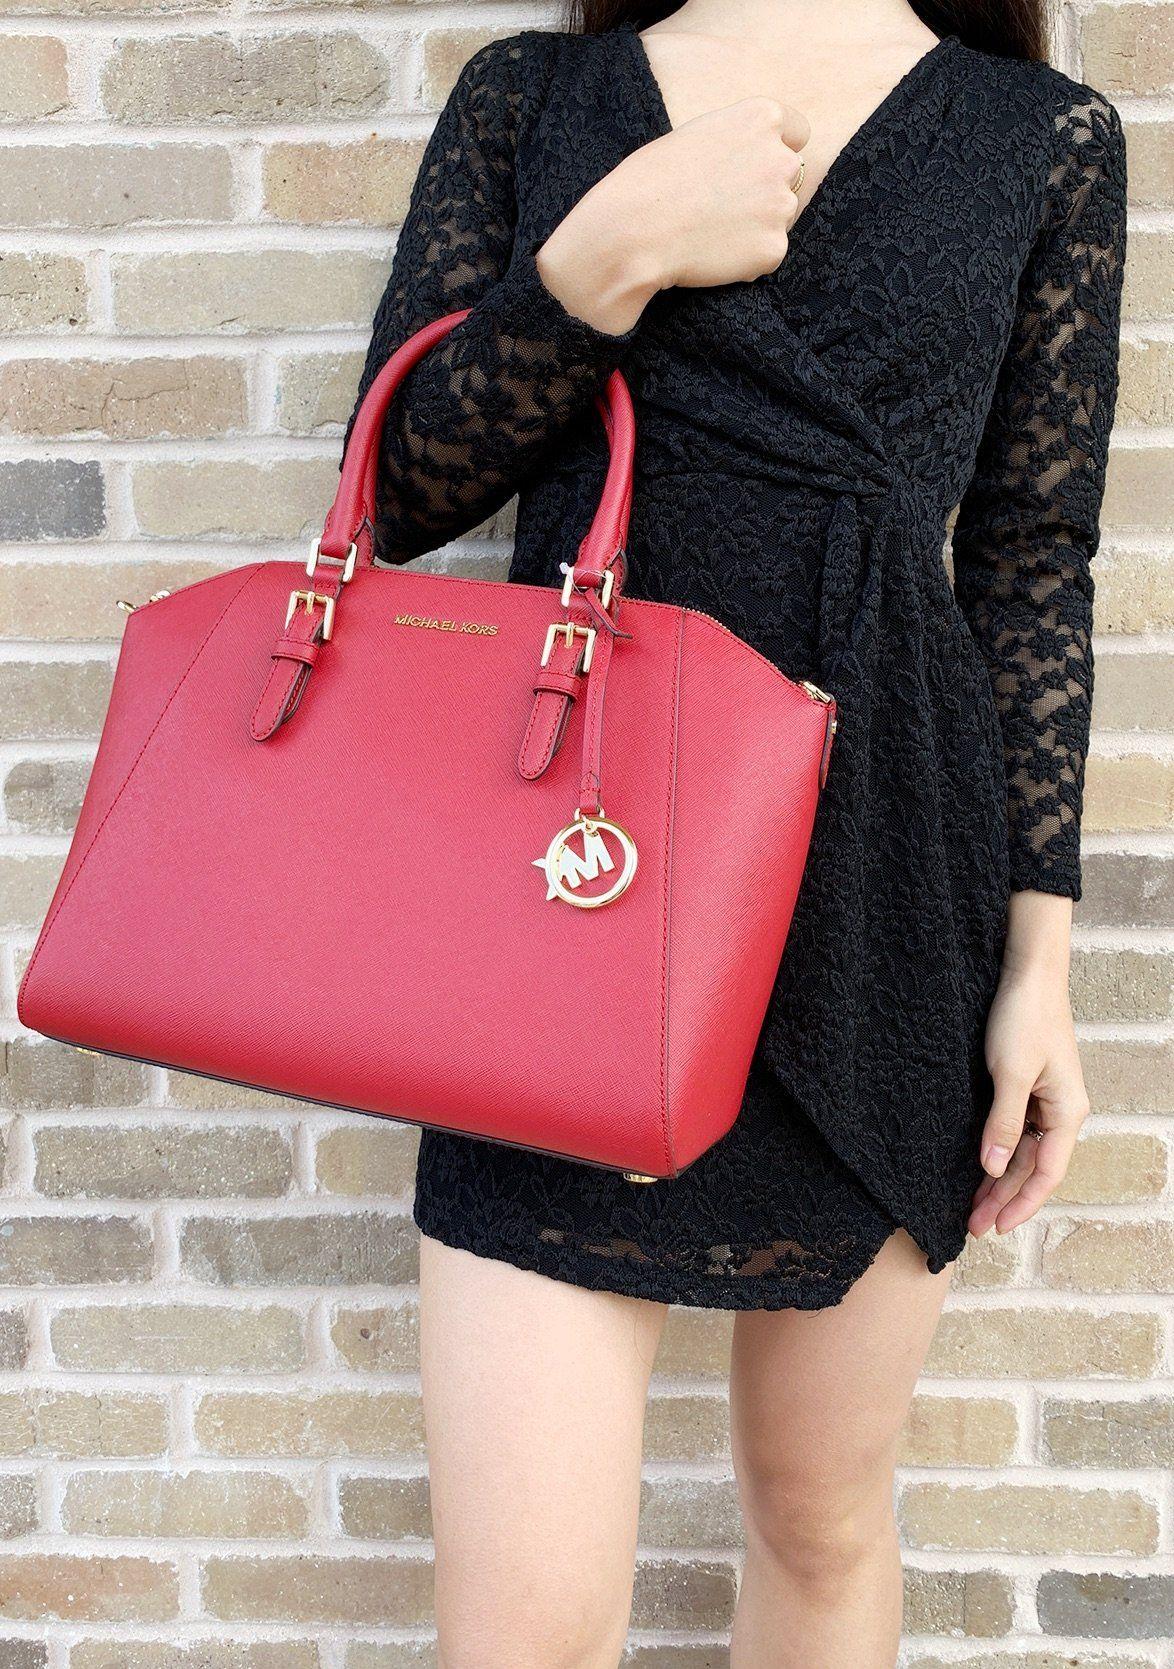 982a0b21d093 Michael Kors Ciara Saffiano Large Top Zip Satchel Crossbody Scarlet Red #MK  #poshfind #poshcloset #ebayseller #poshmark #mercari #Handbags  #ebaybusiness ...